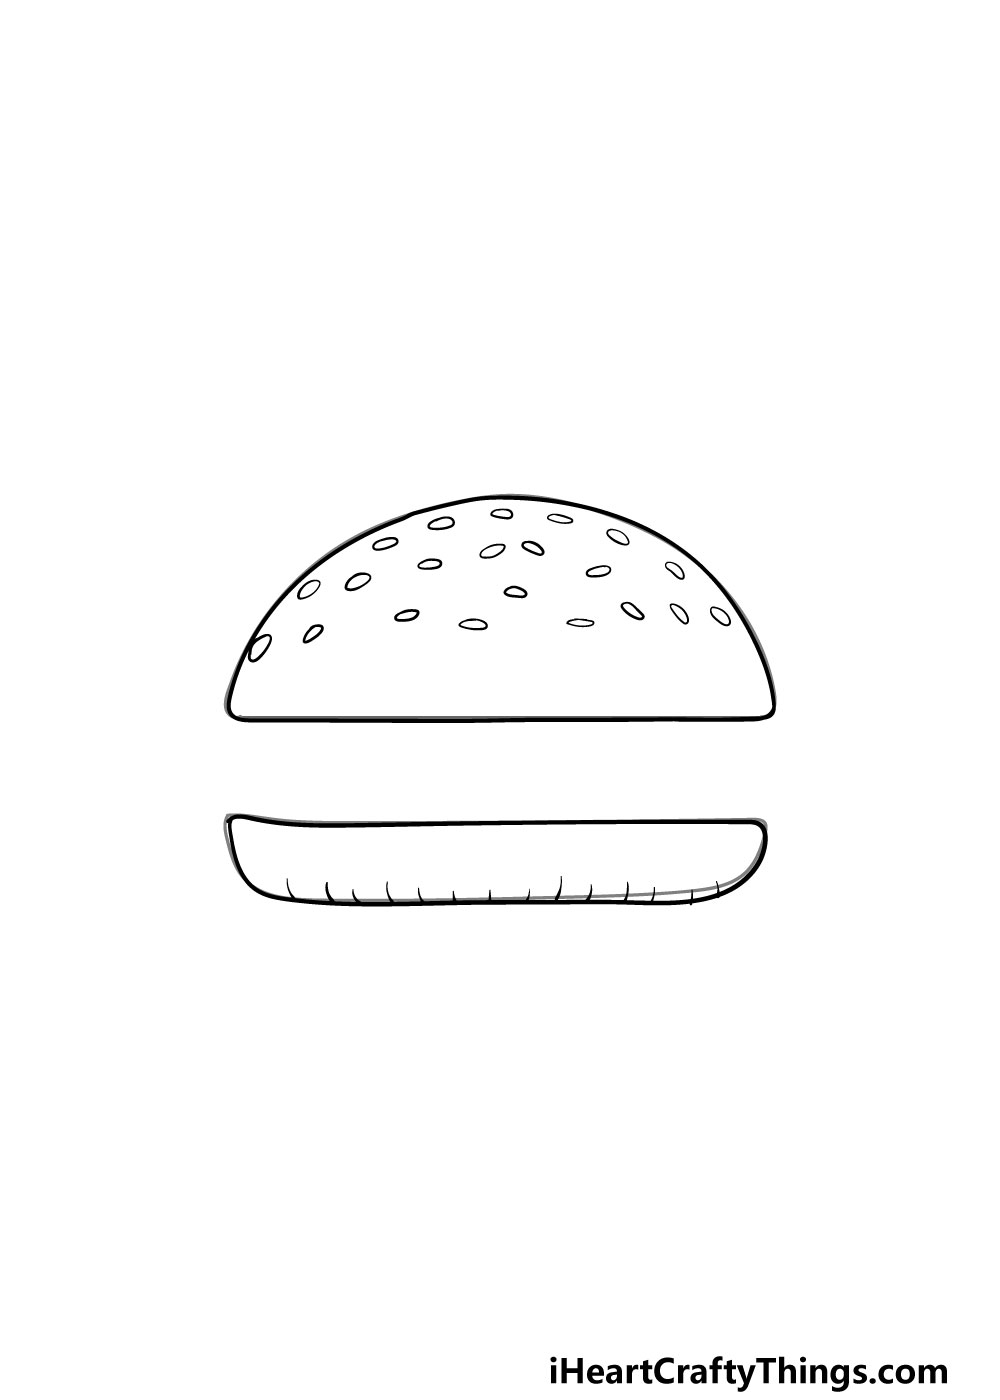 drawing a bun step 5